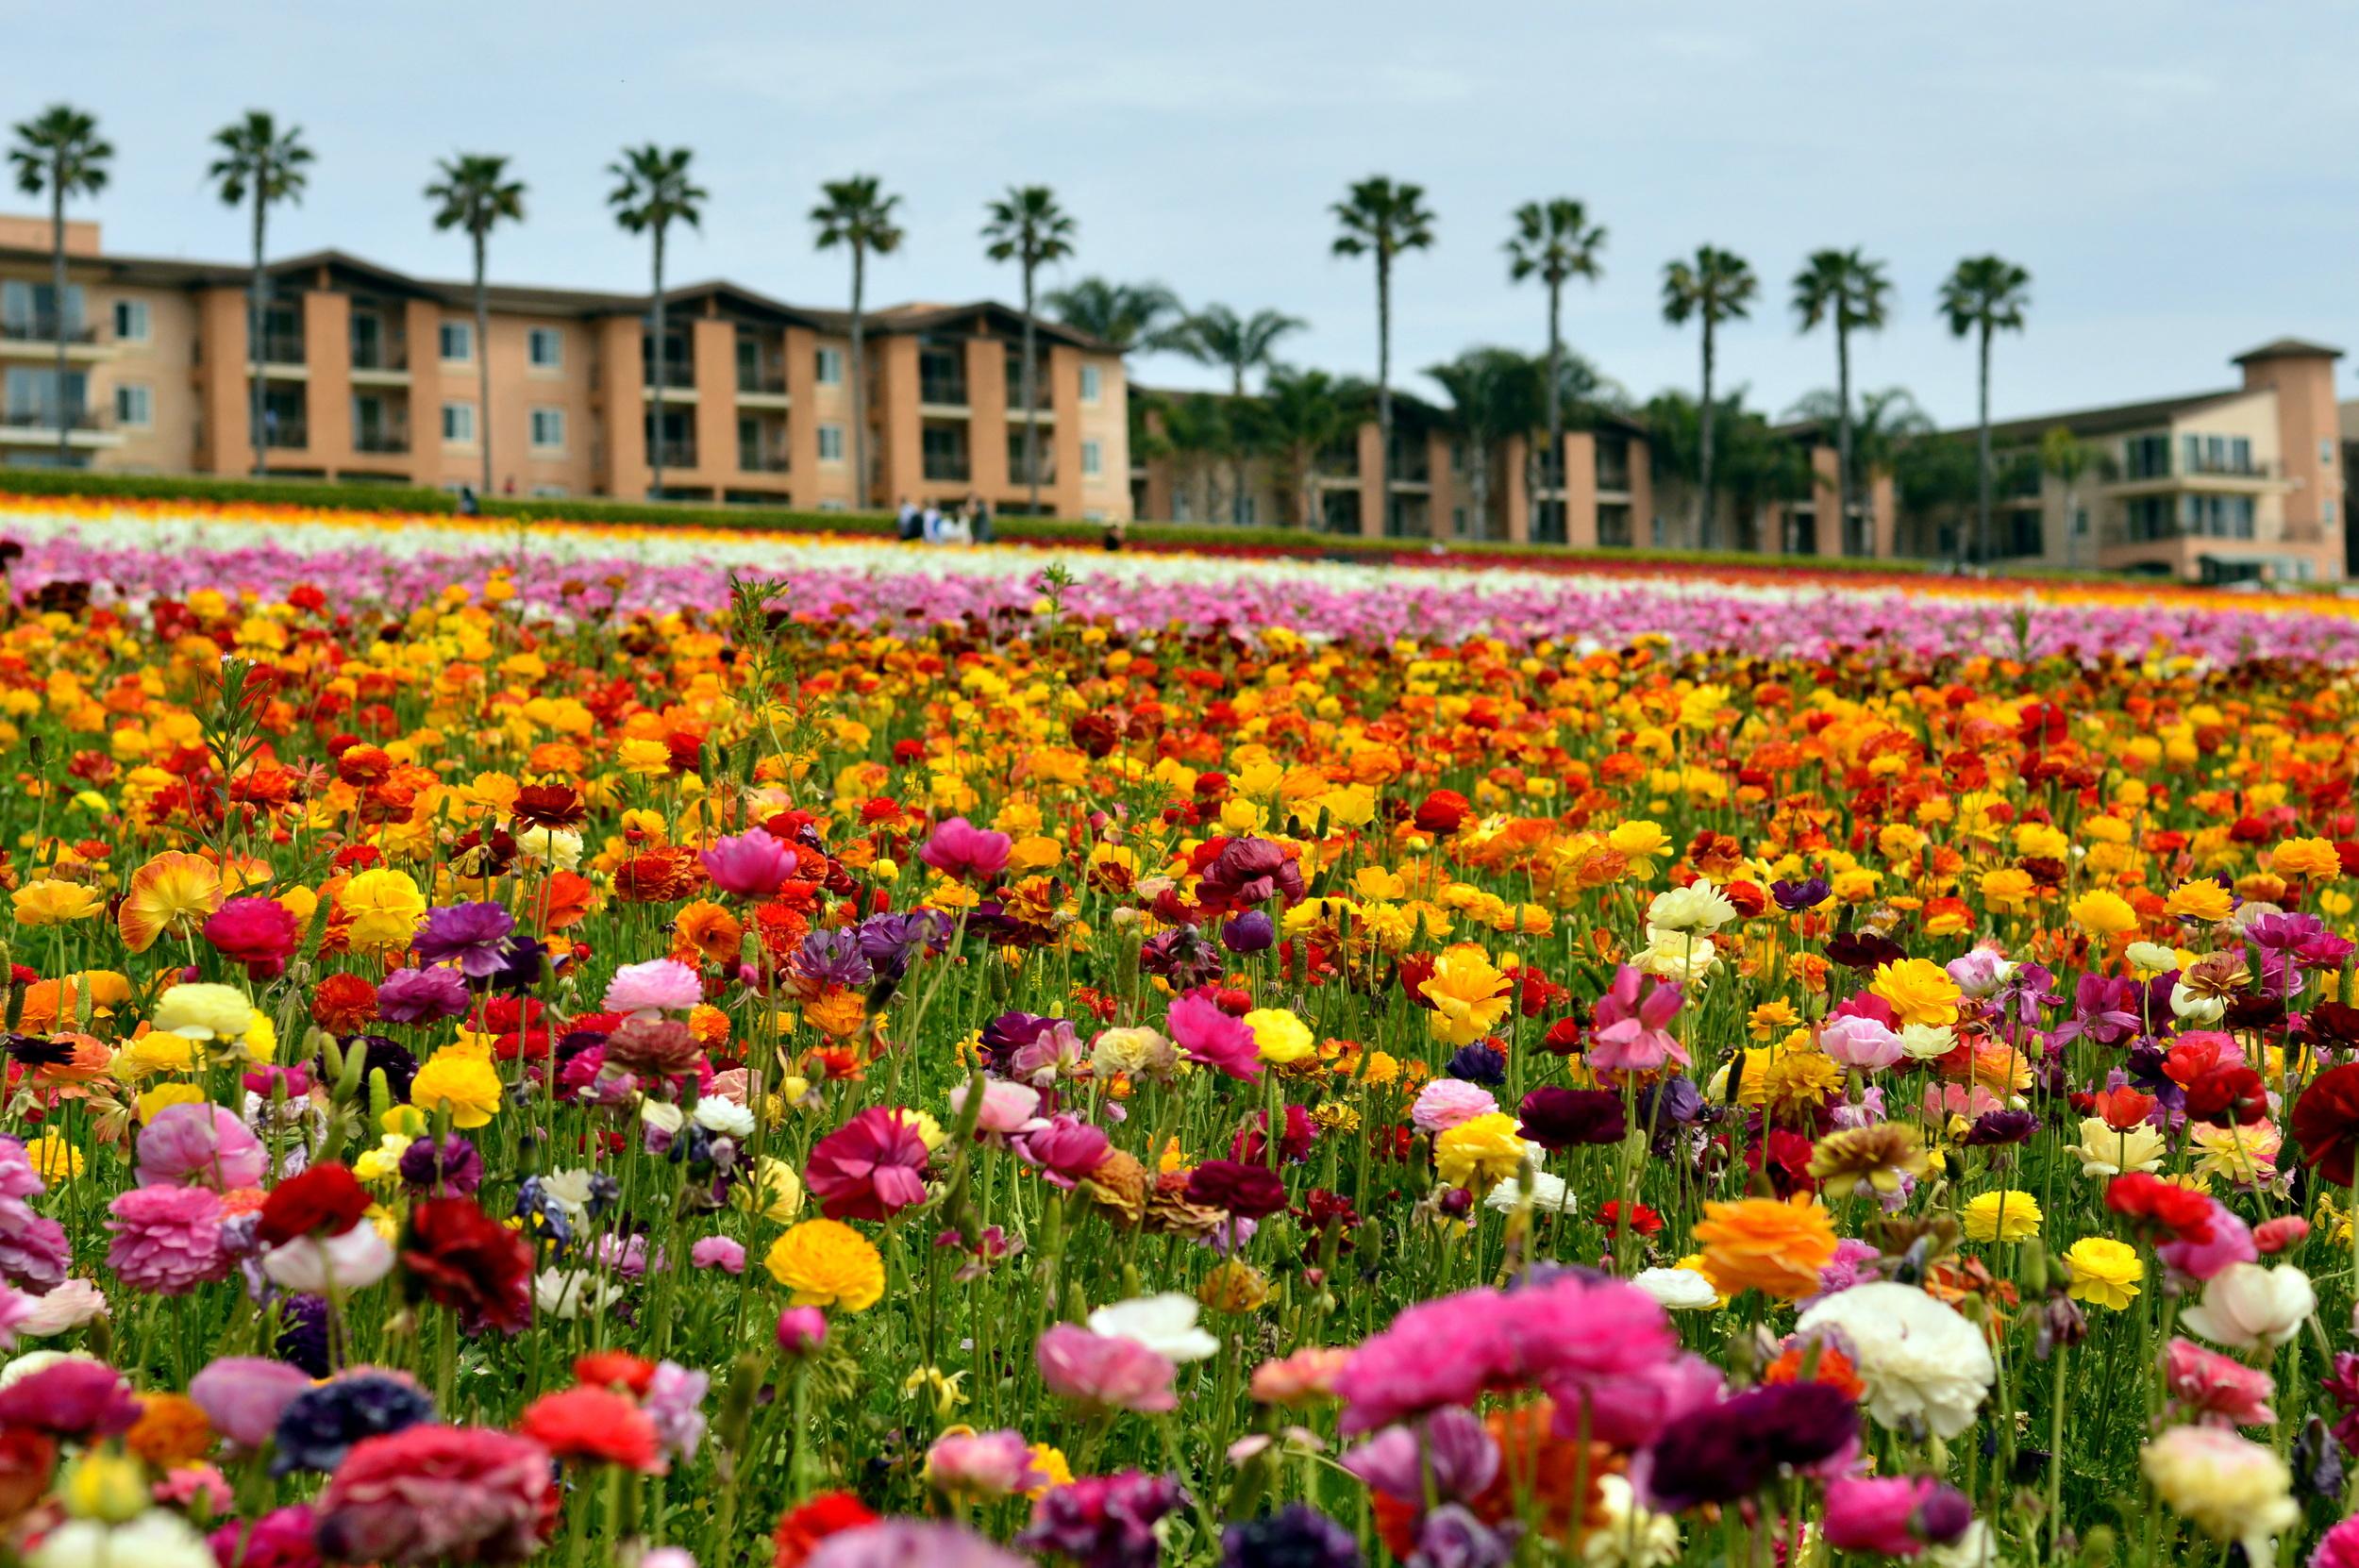 carlsbad-flower-fields-california-travel-blogger